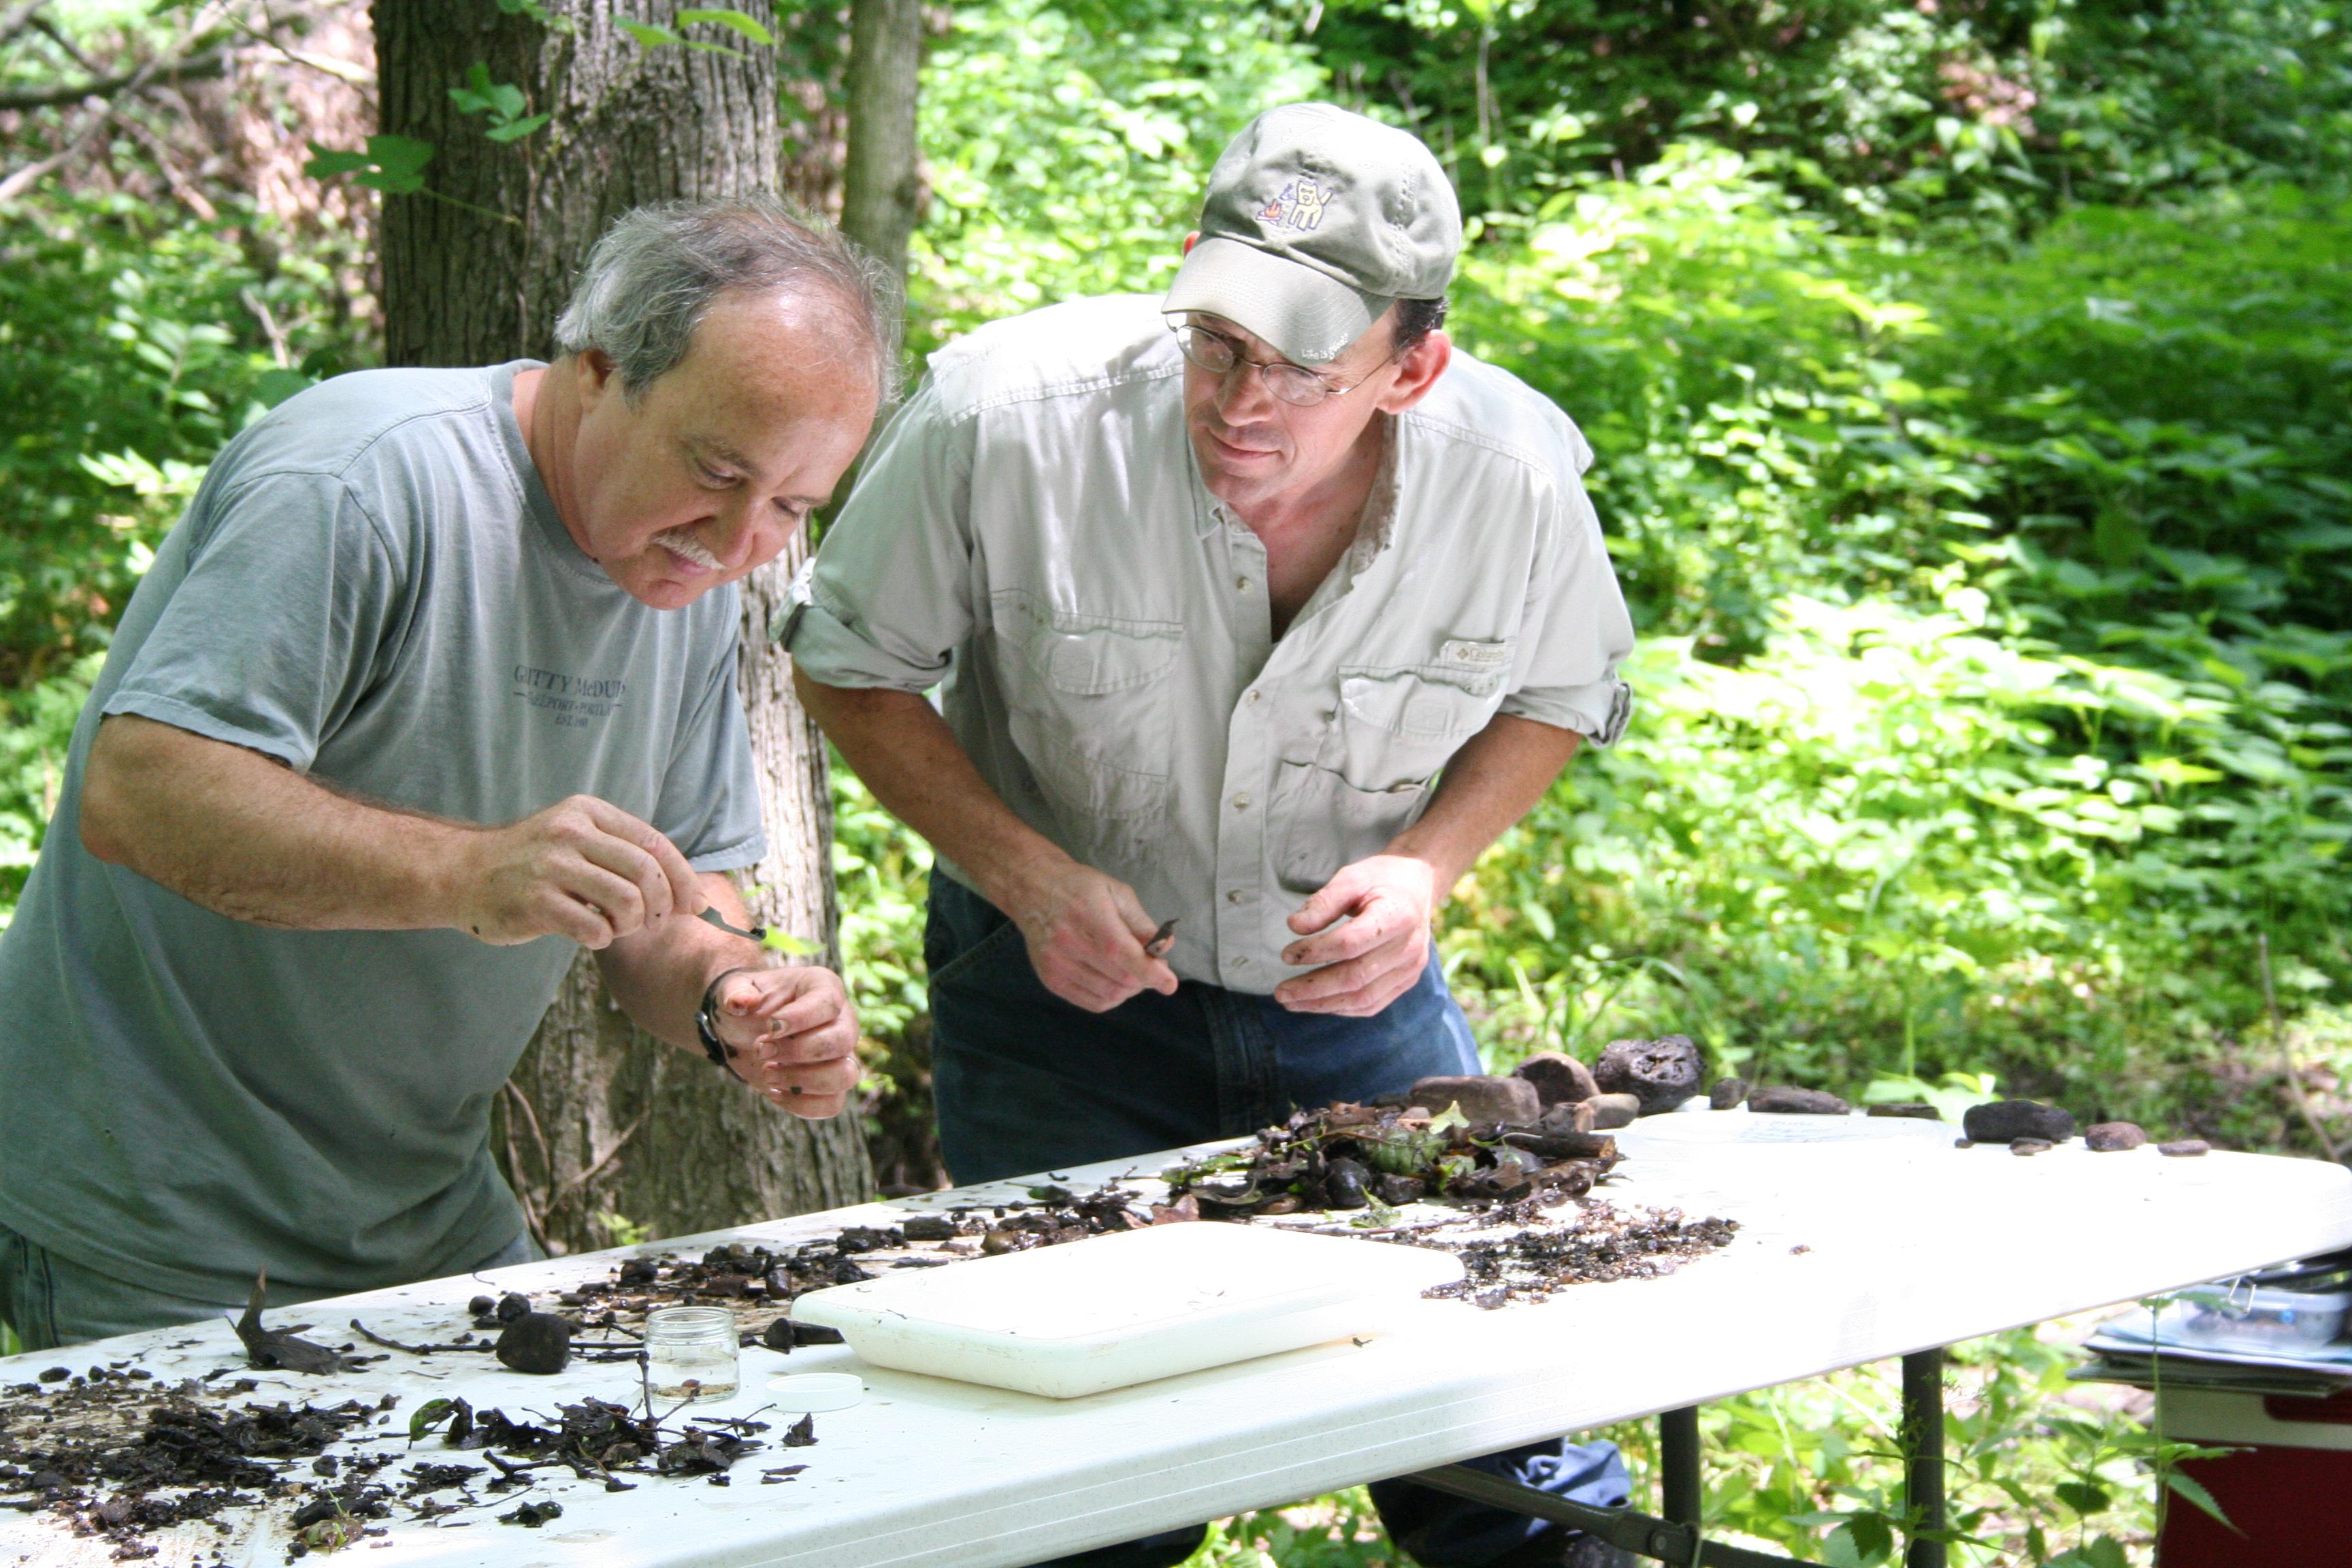 Scott and Bruce collect invertebrates during invertebrate